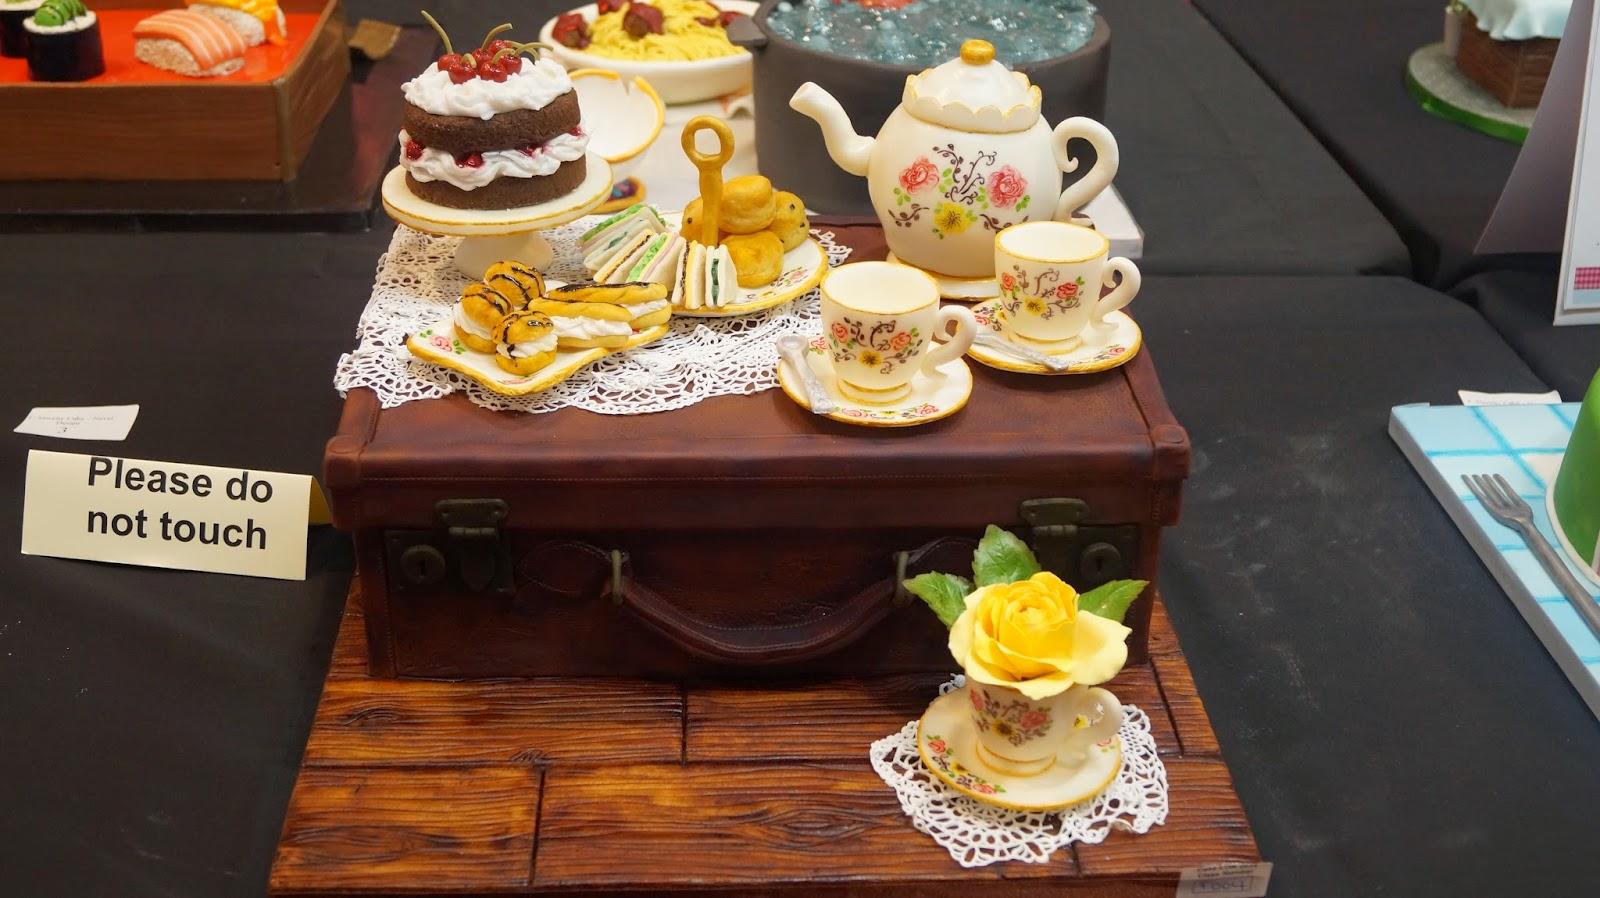 http://cupcakeluvs.blogspot.dk/2015/04/london-1-cake-international-show-2015.html